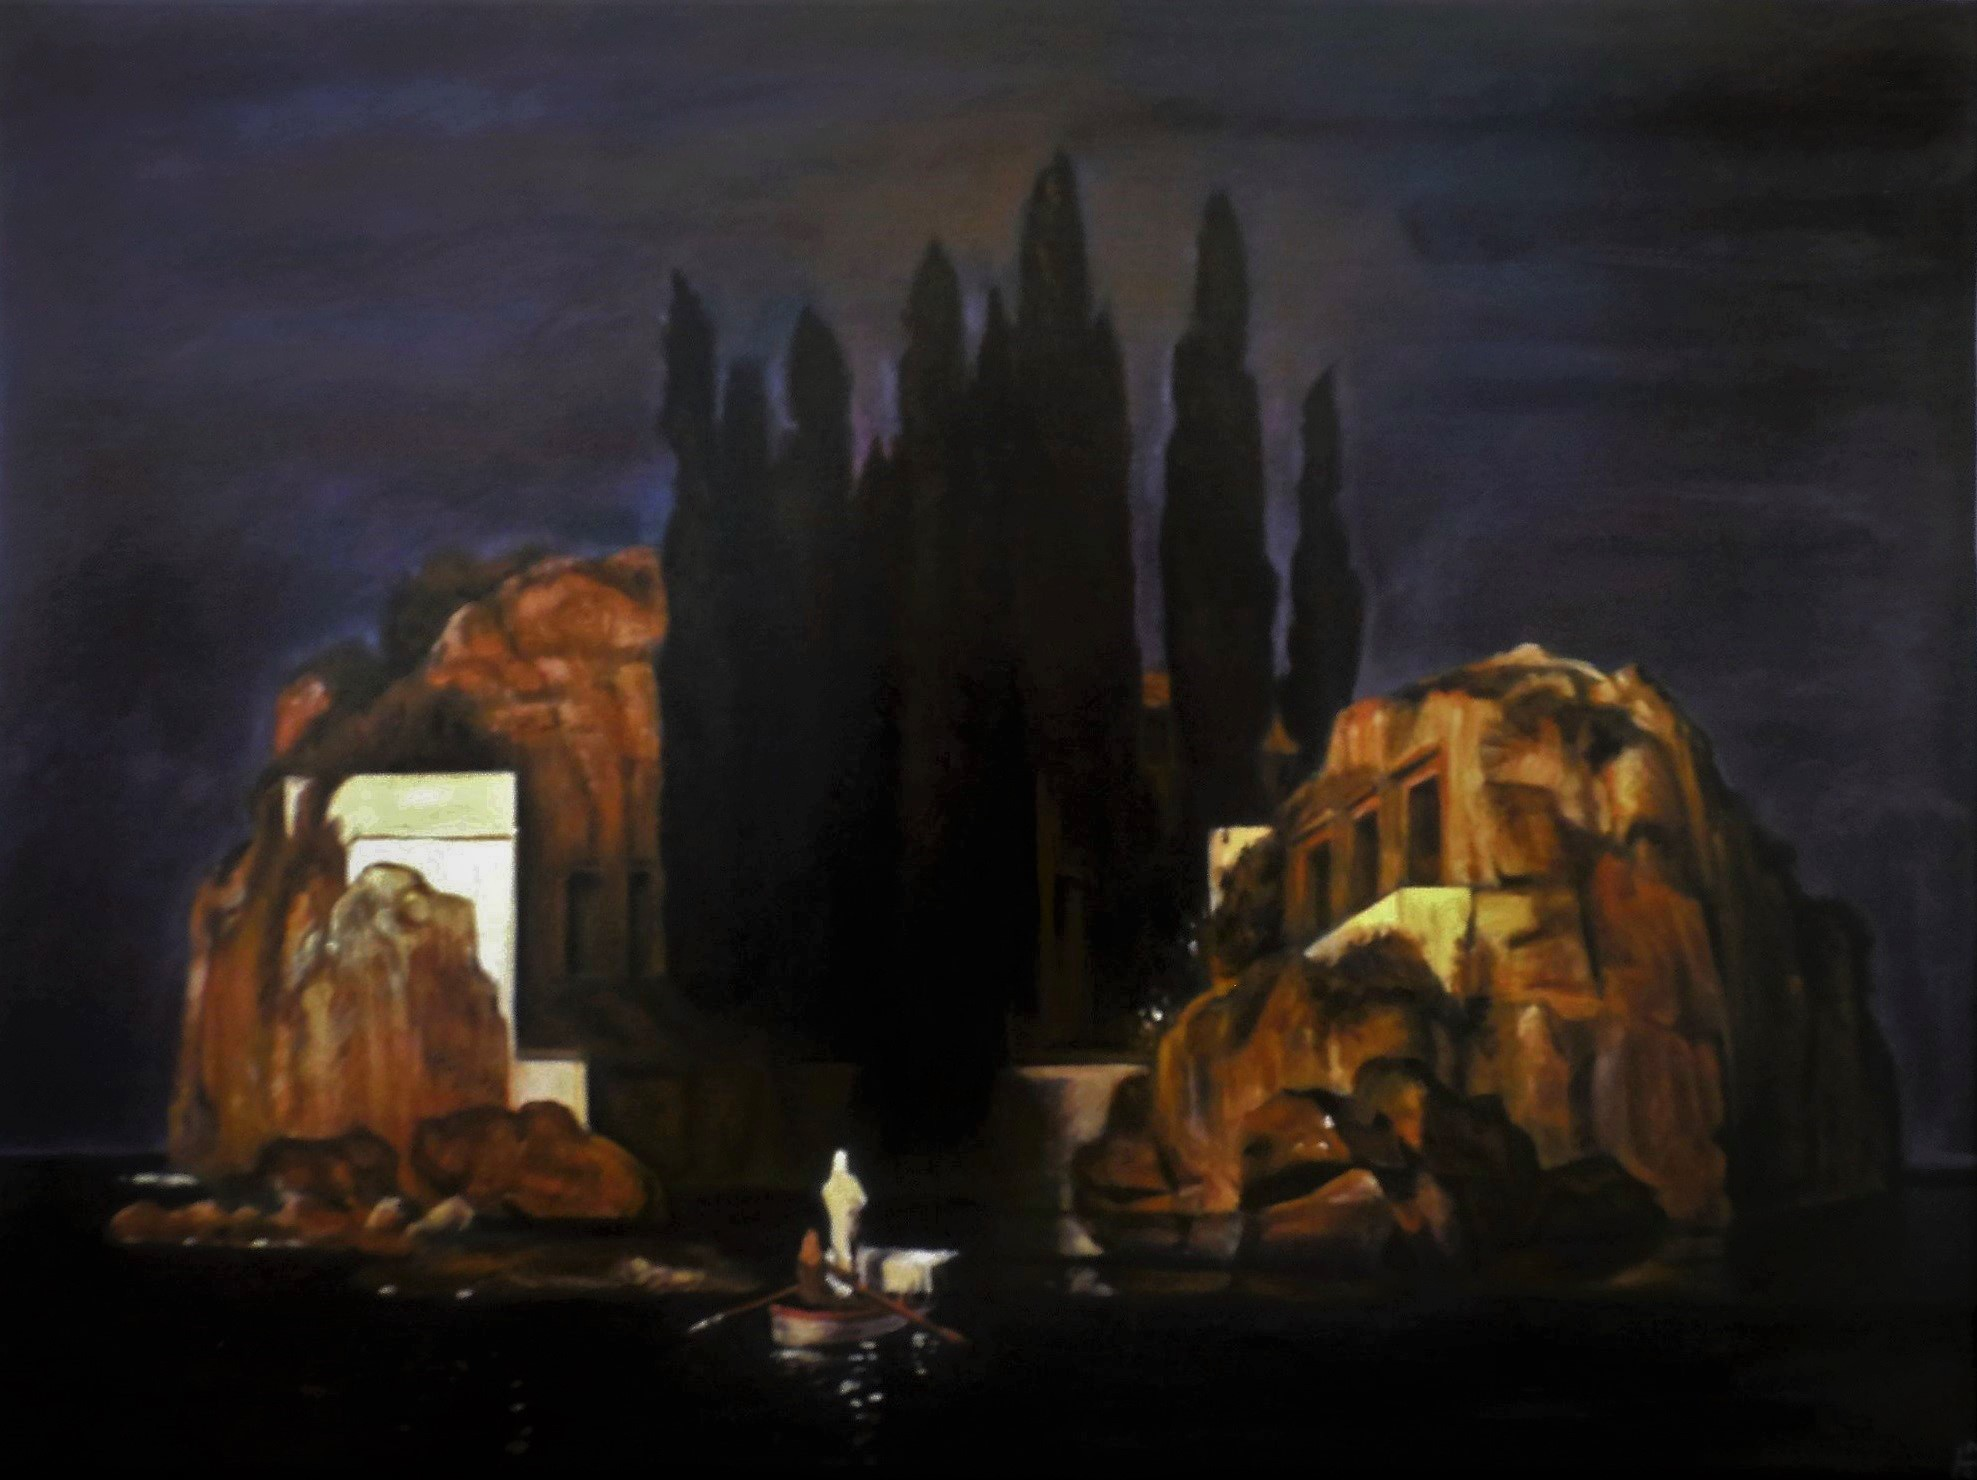 'Die Toteninsel' nach A. Böcklin, Akryl auf Holz, 80 x 59,7 cm